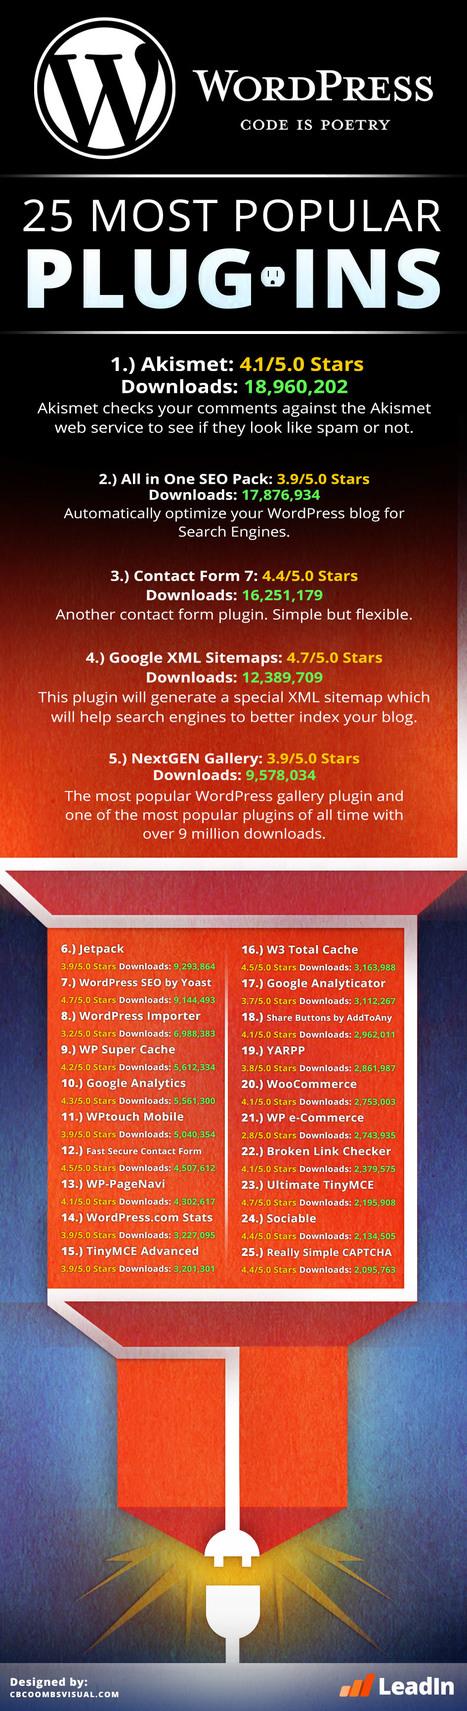 25 mejores plugins WordPress [Infografía] | Infografias | Scoop.it